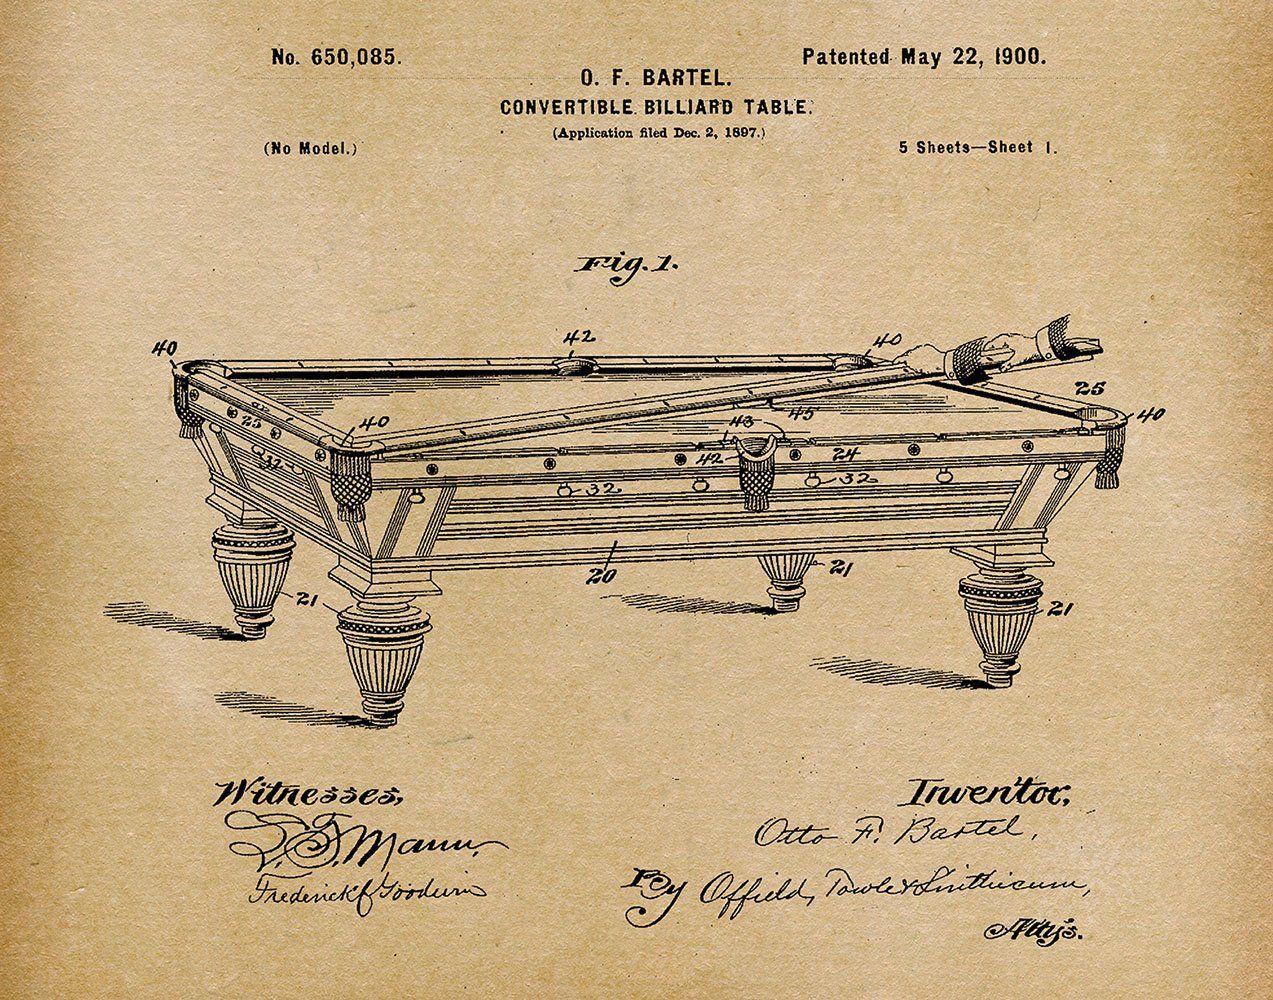 1897 Convertible Billiard Table Patent Print Art Drawing Poster 18X24